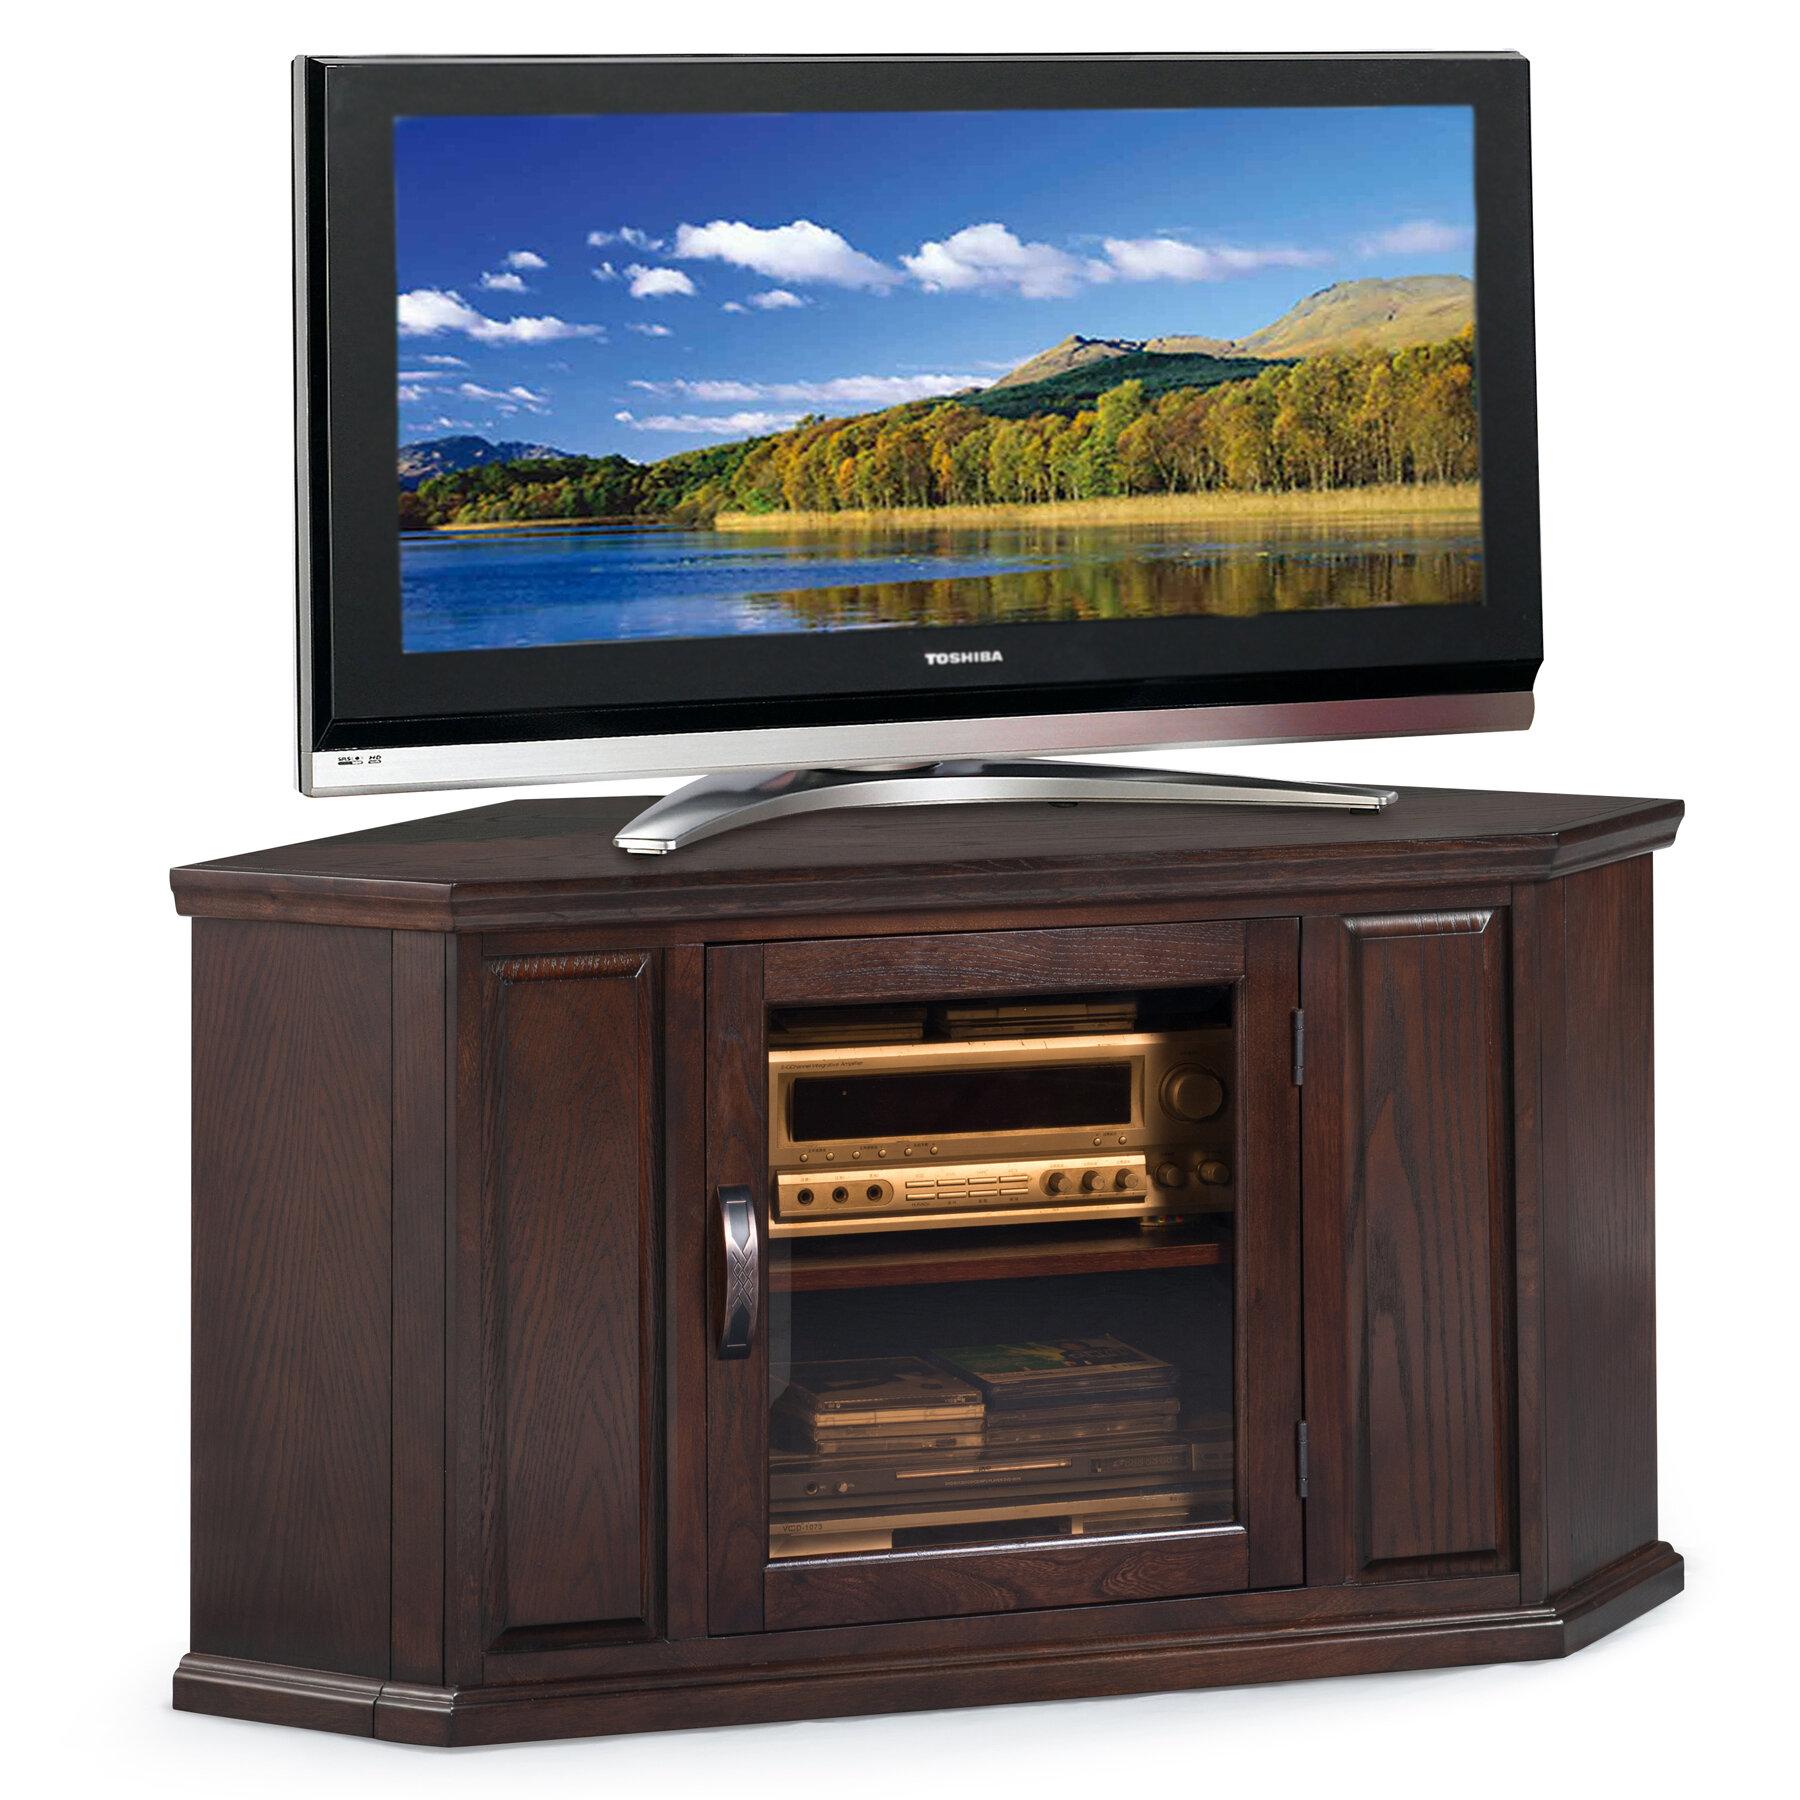 leick furniture tv stand lkf1586 ebay. Black Bedroom Furniture Sets. Home Design Ideas